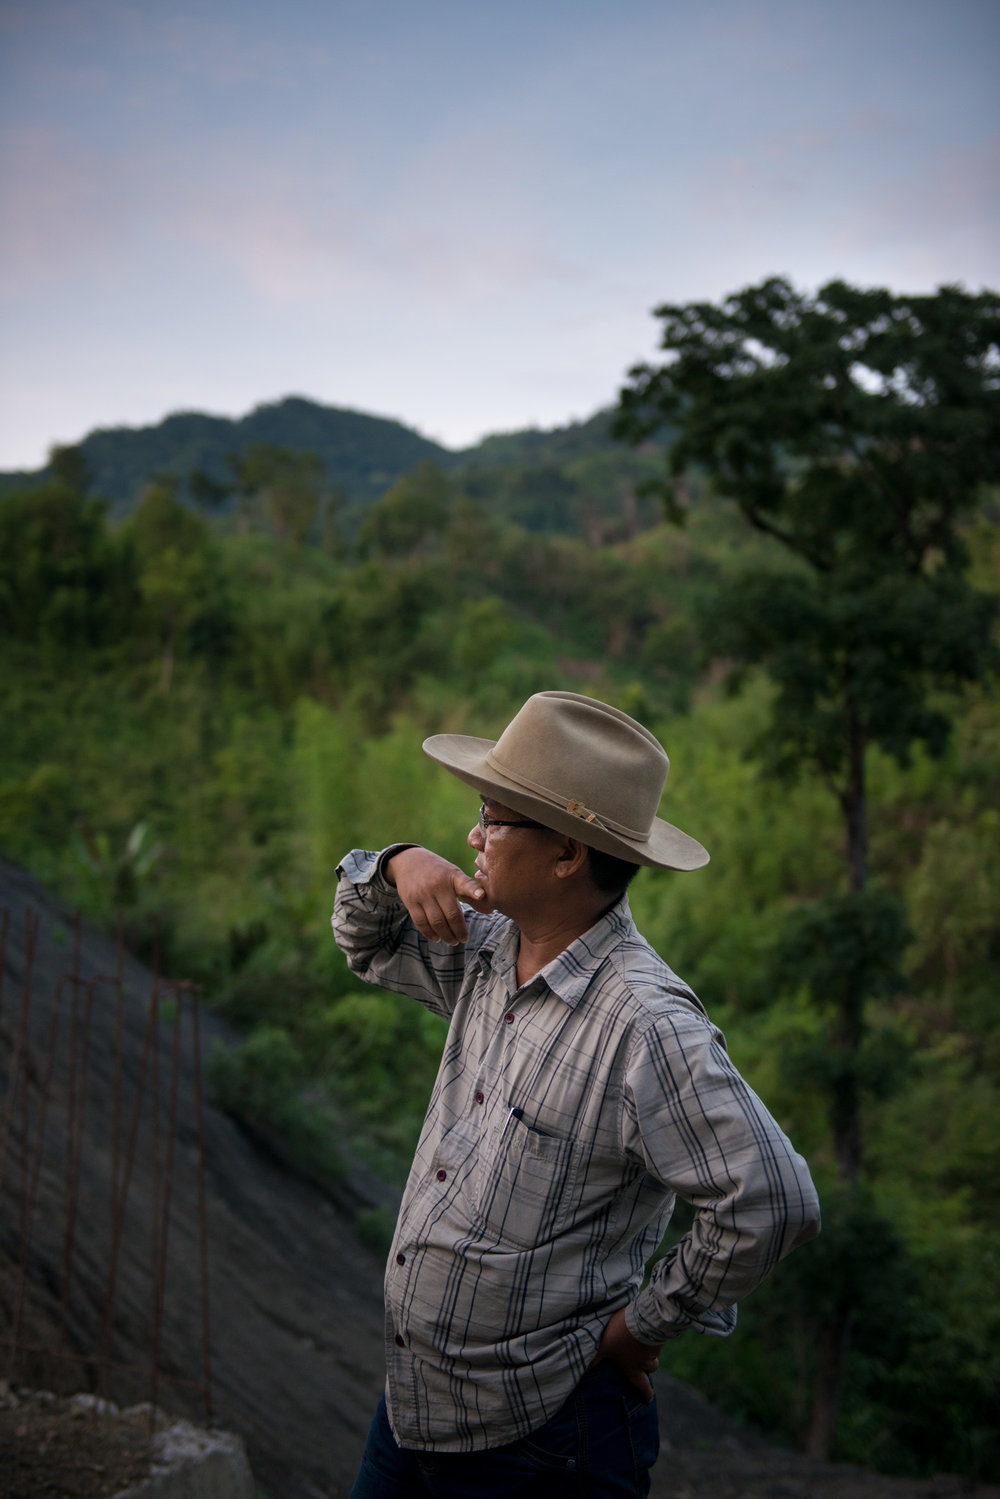 17_Chhandak Pradhan-Reportage-The_Promise_of_Asphalt-Border_road_NE India_Burma_Le Monde.jpg